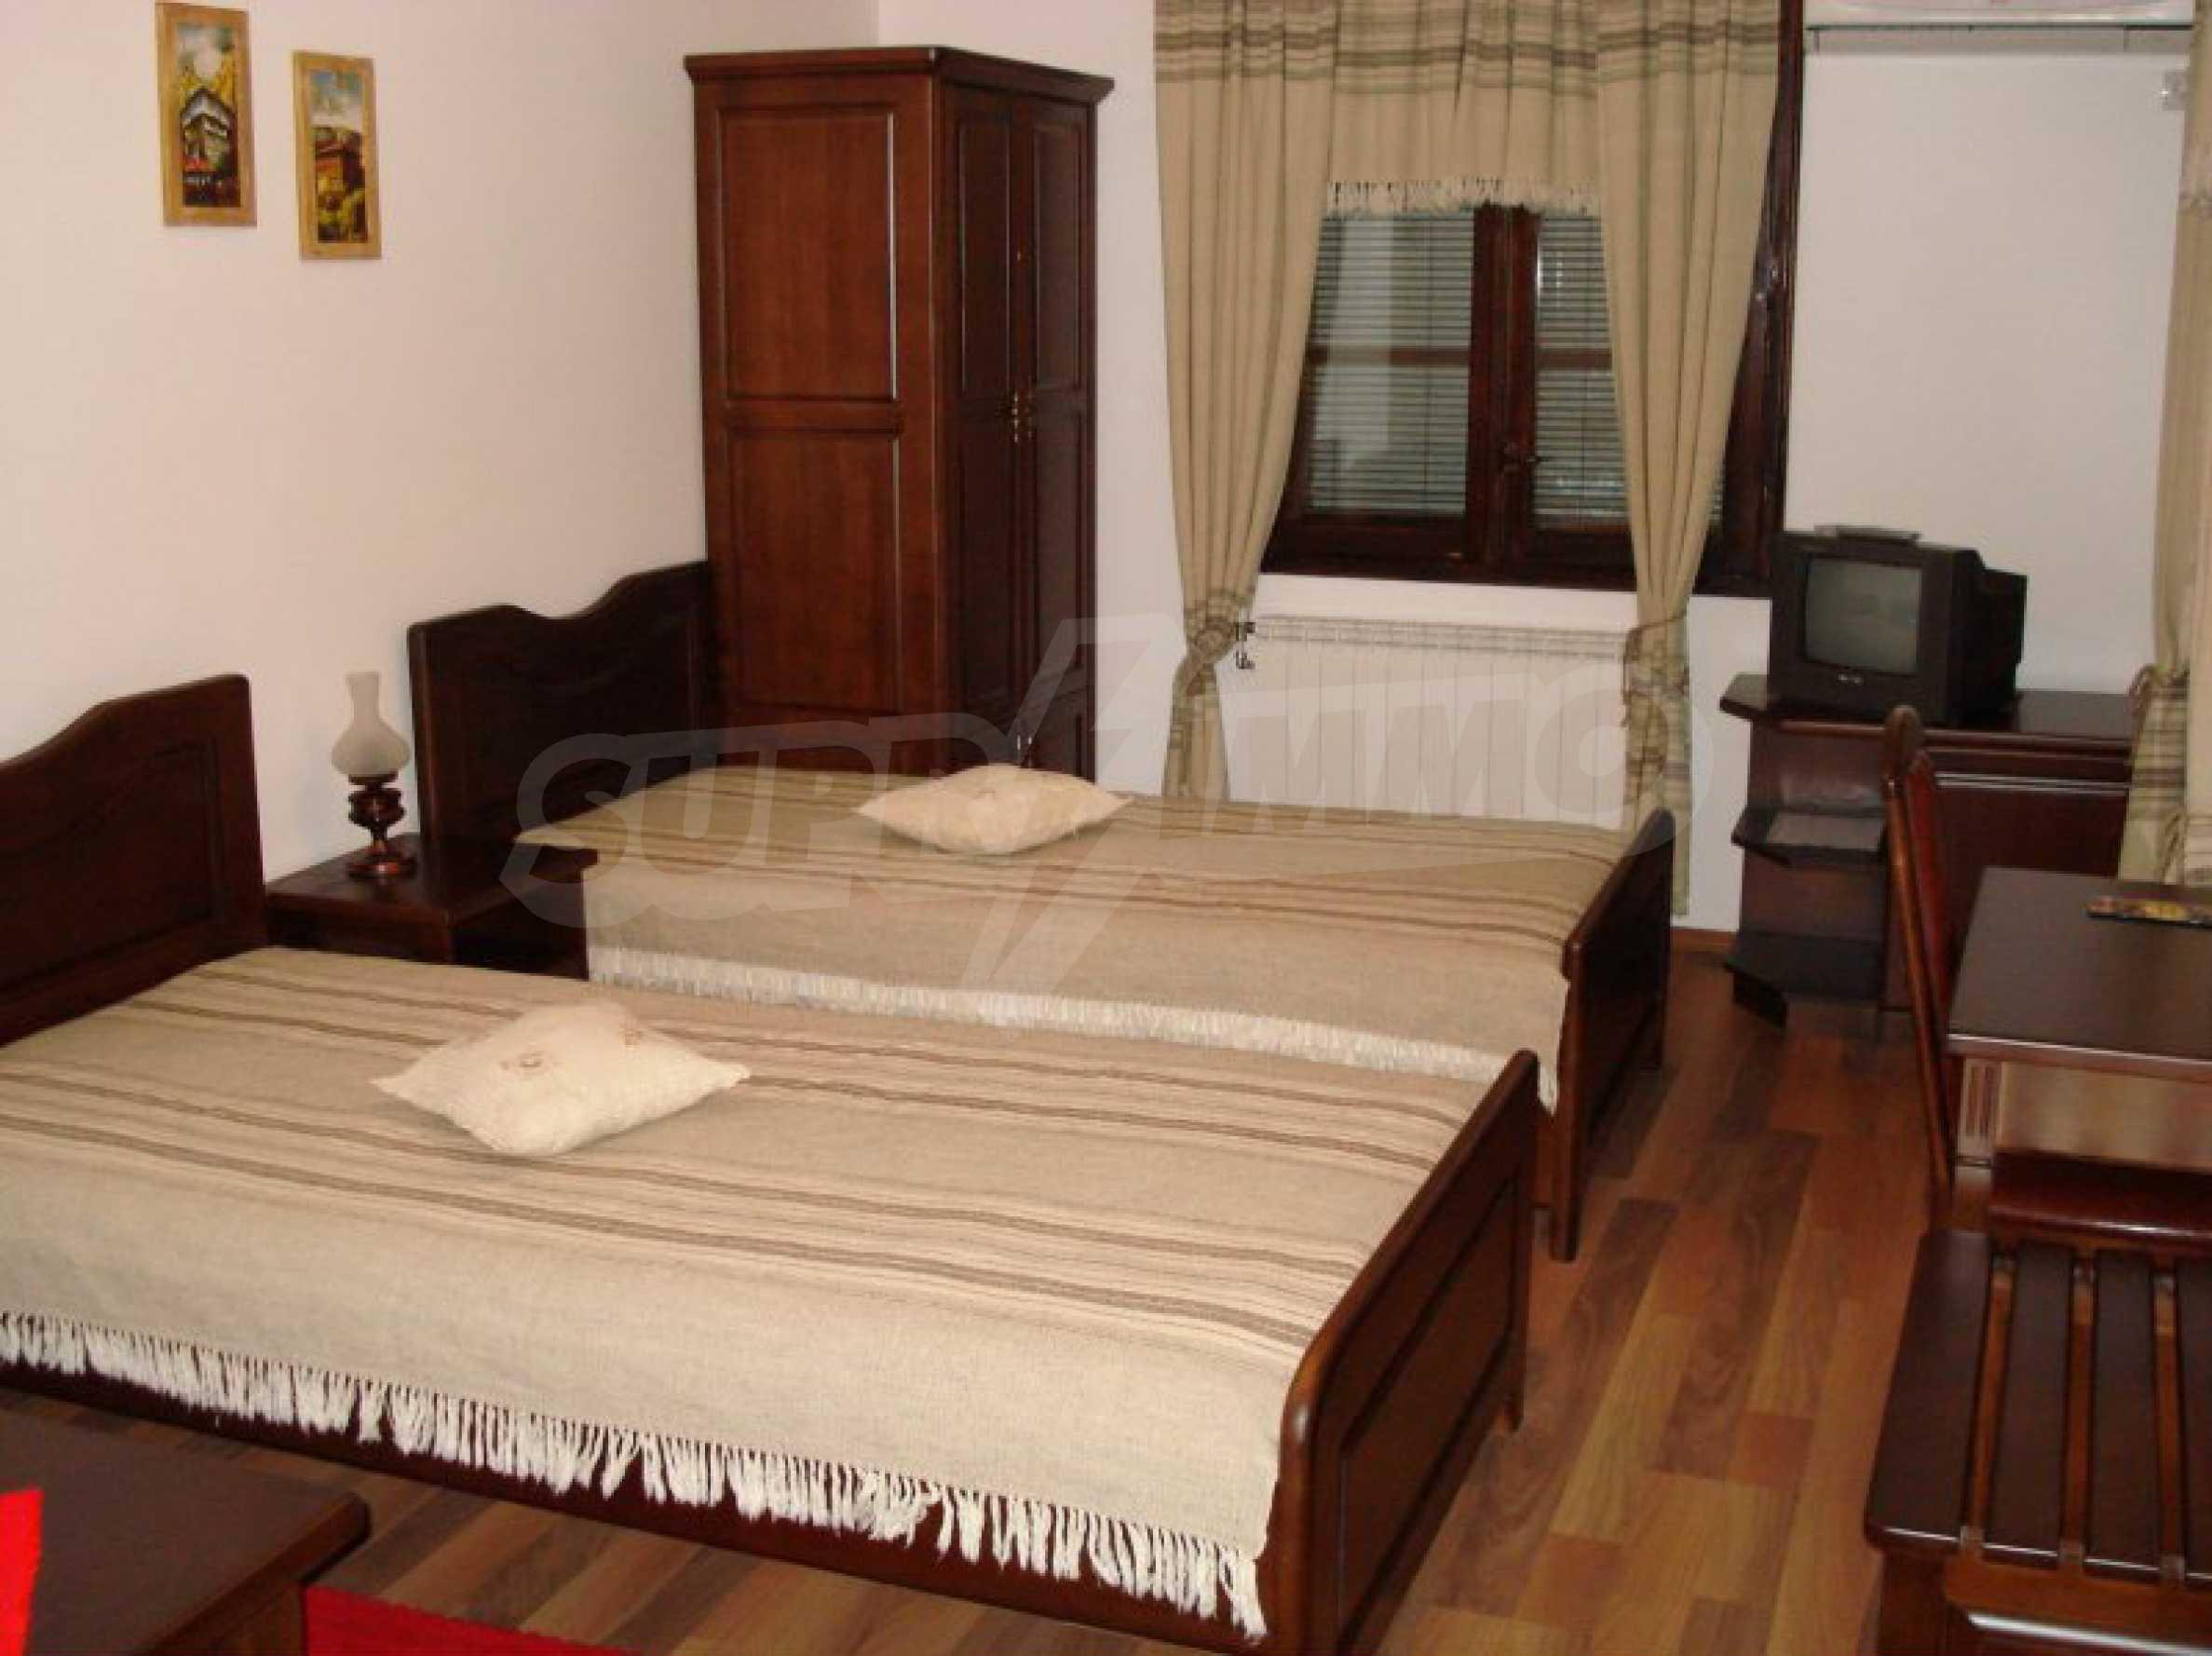 Hotelanlage mit Restaurant am Ufer des Flusses Osam in Lovech 41